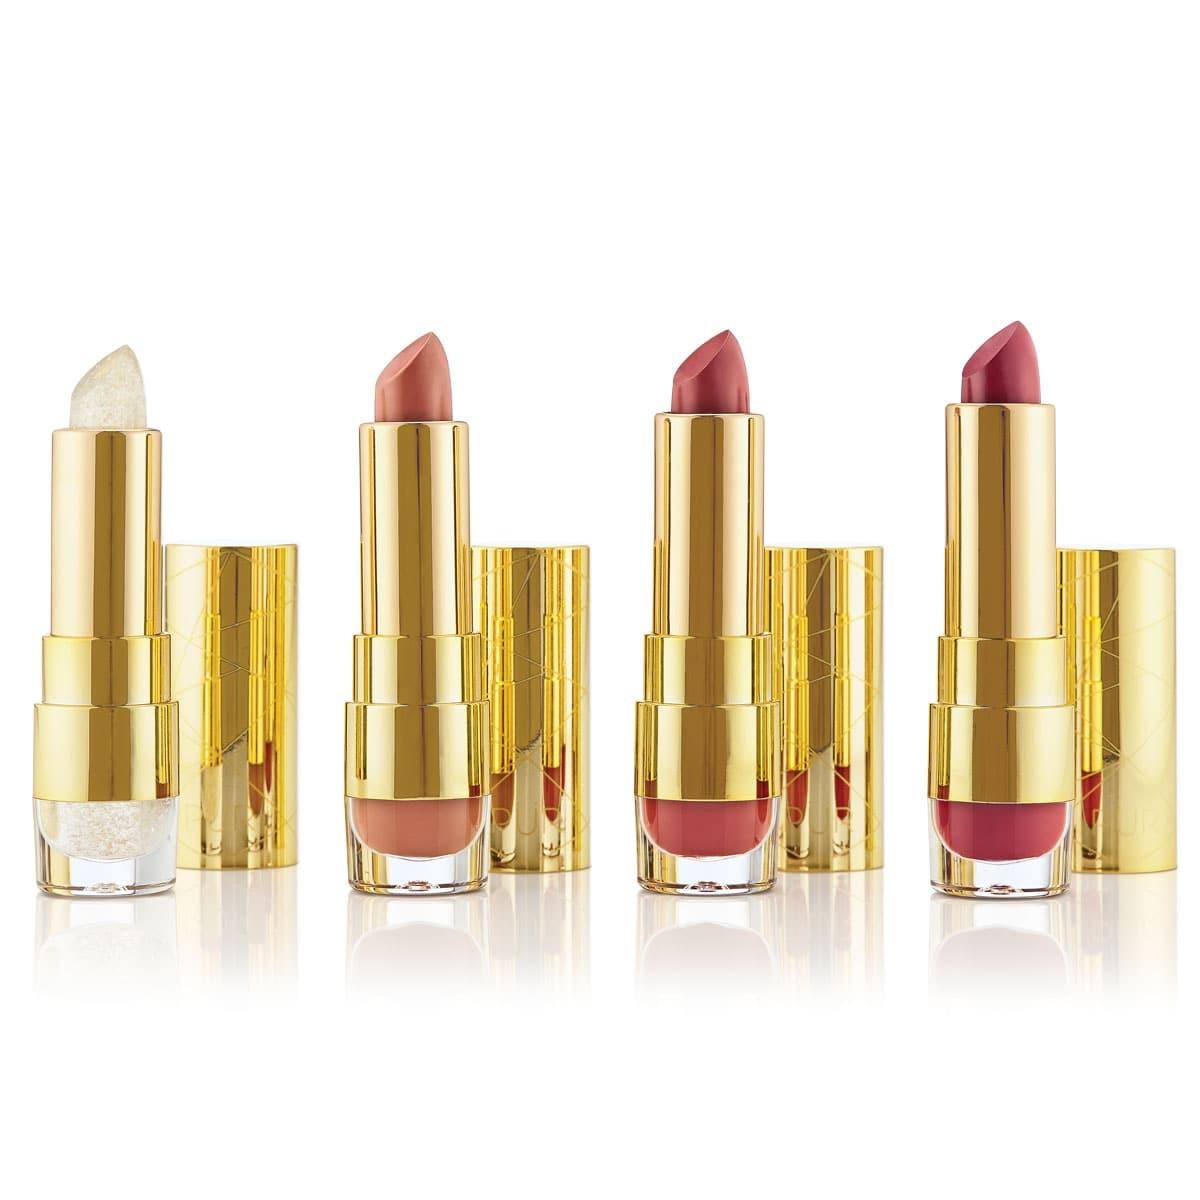 Sweet 16 Kiss of Confidence Lipstick Trio + Lip Balm Set